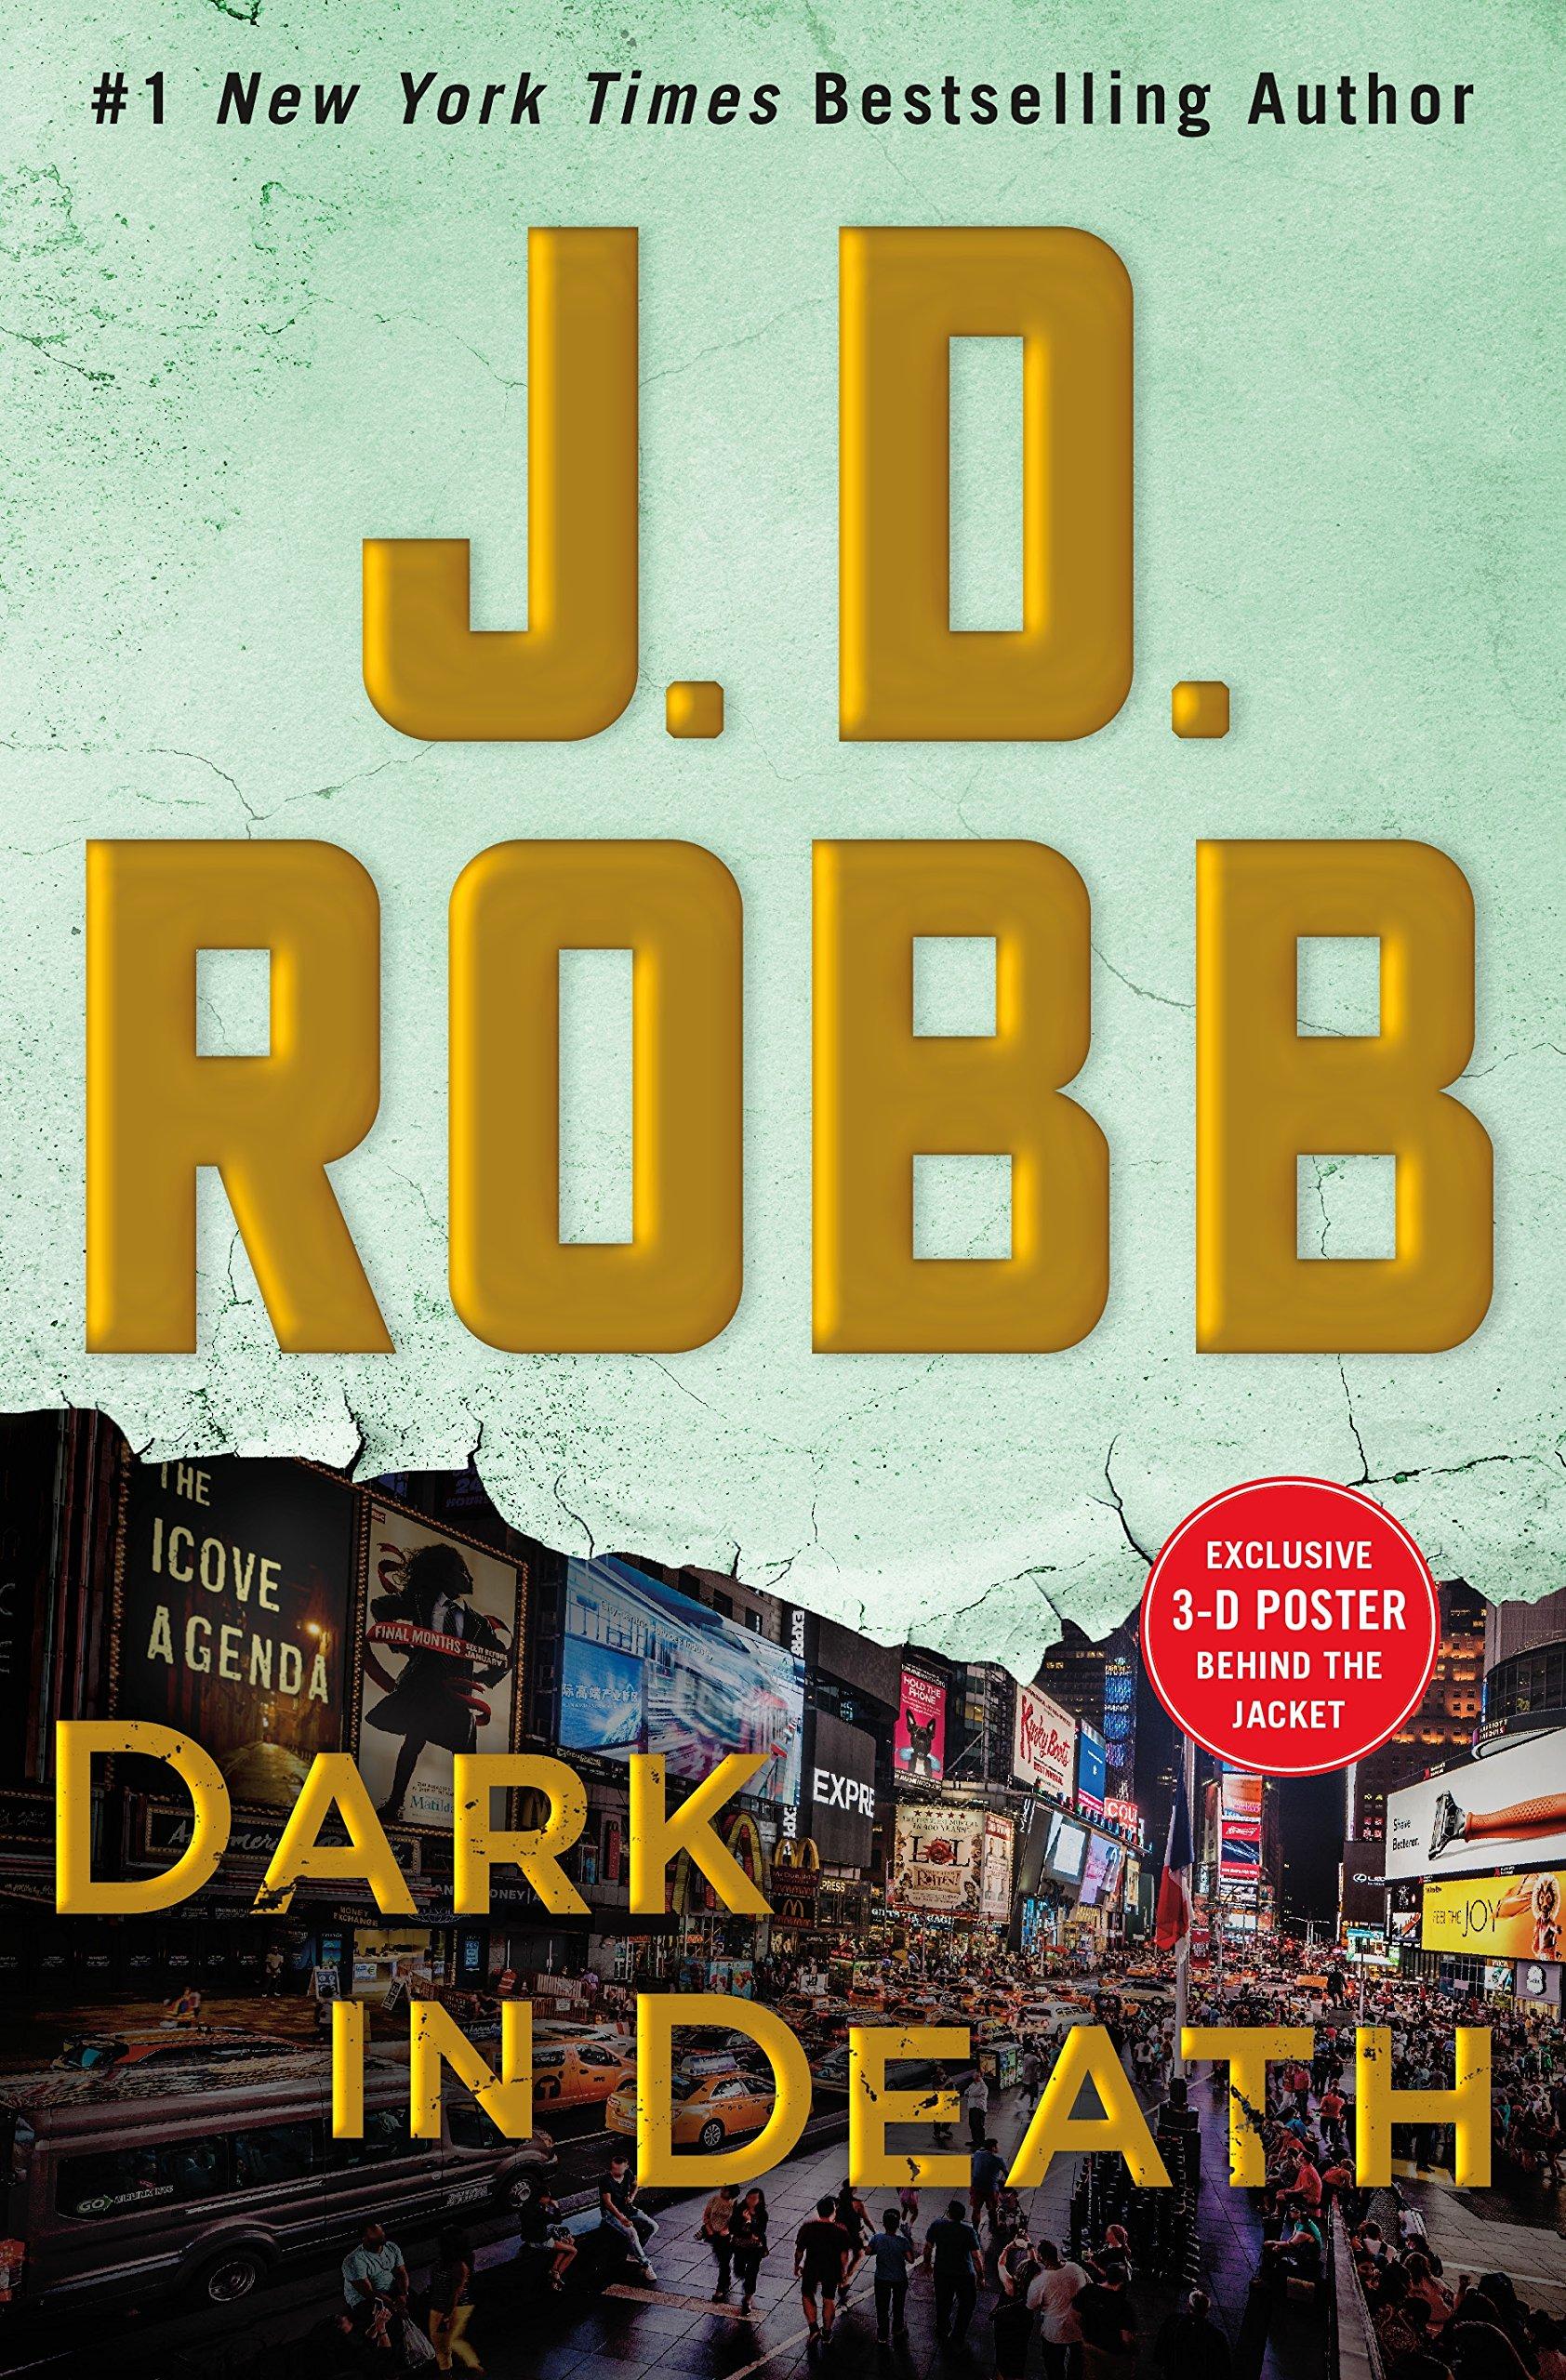 death in dark by jd robb.jpg